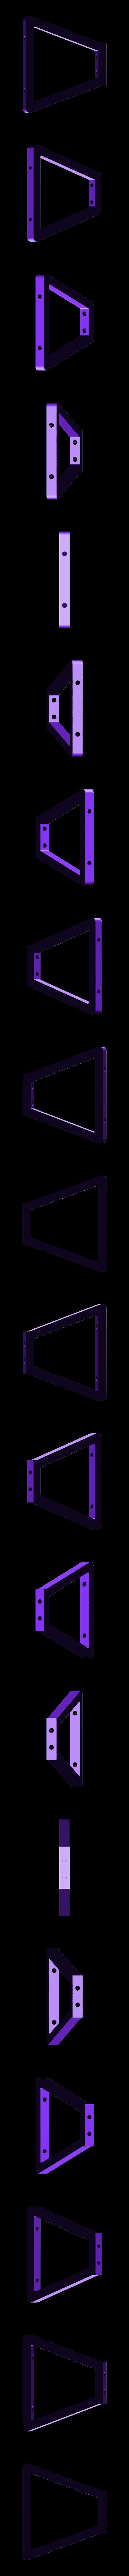 arm.stl Download free STL file Heat Set Insert Press • 3D printer object, Adafruit